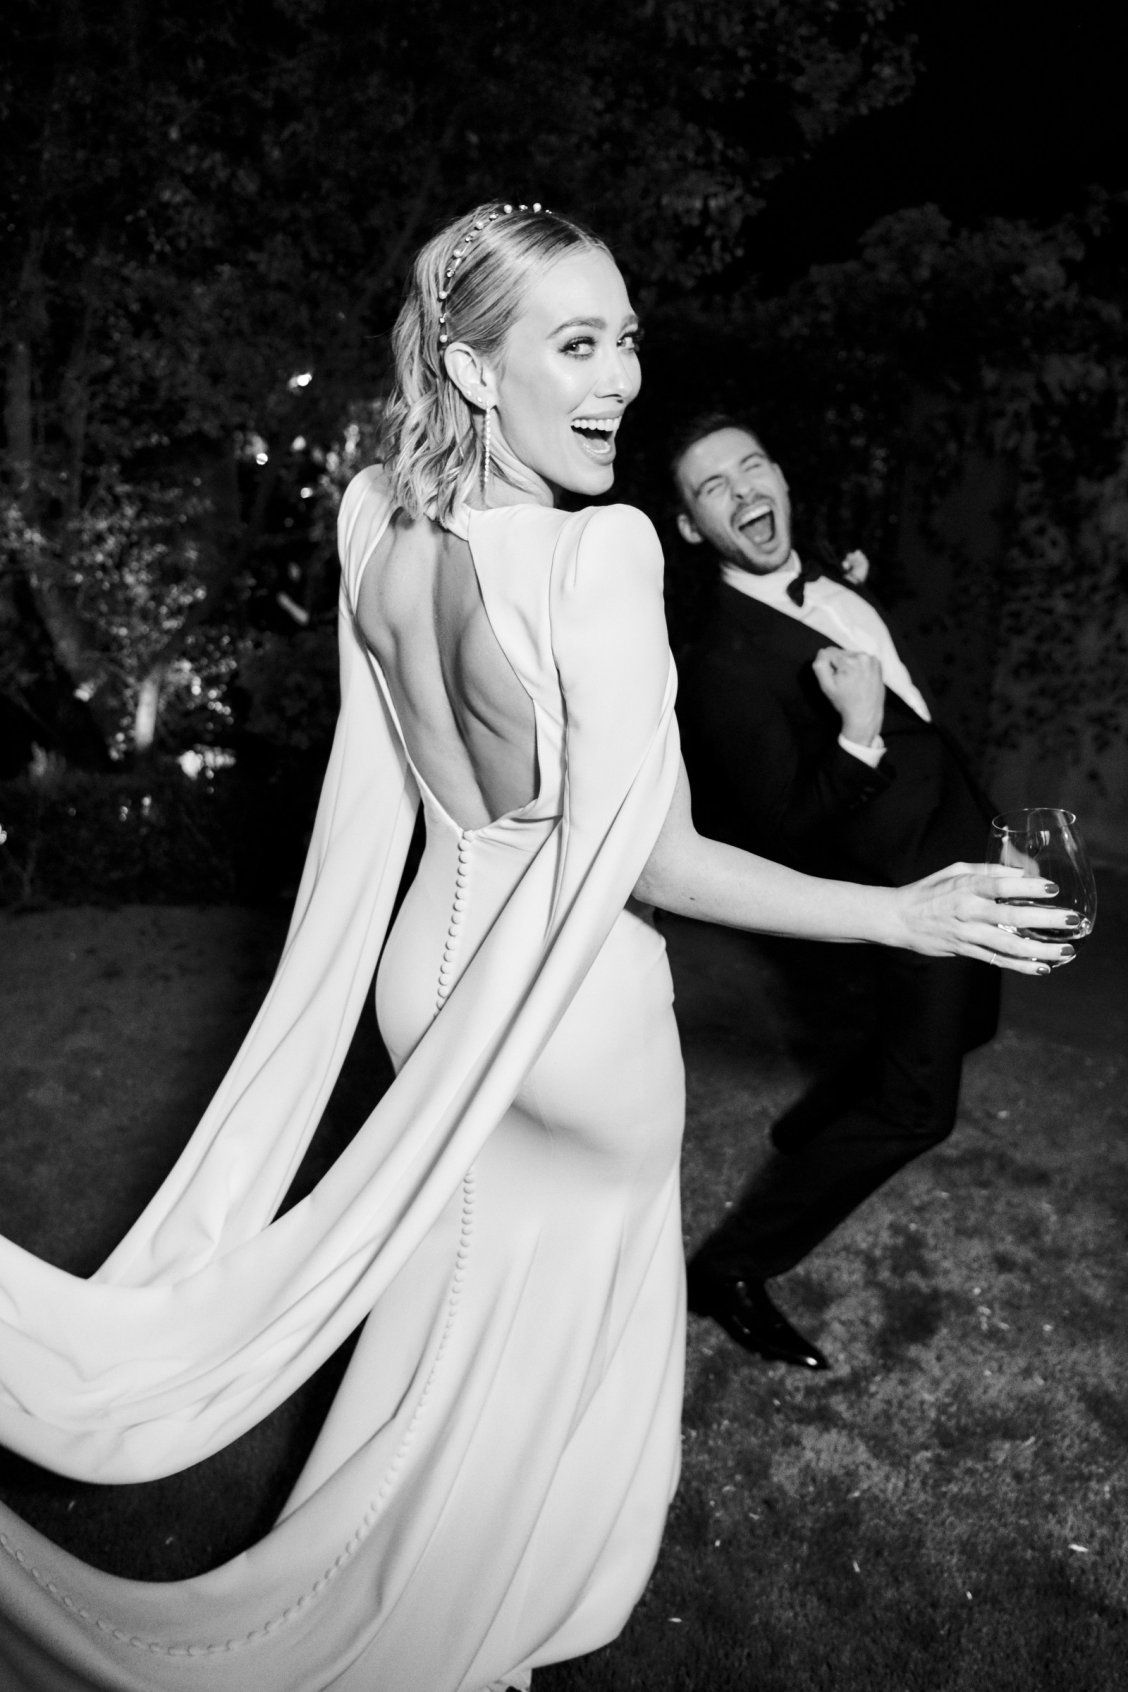 Hilary Duff Wore The Jennifer Behr Ines Headband On Her Wedding Day Such A Sleek And Modern Finishing T In 2020 Vogue Wedding Hillary Duff Wedding Celebrity Weddings